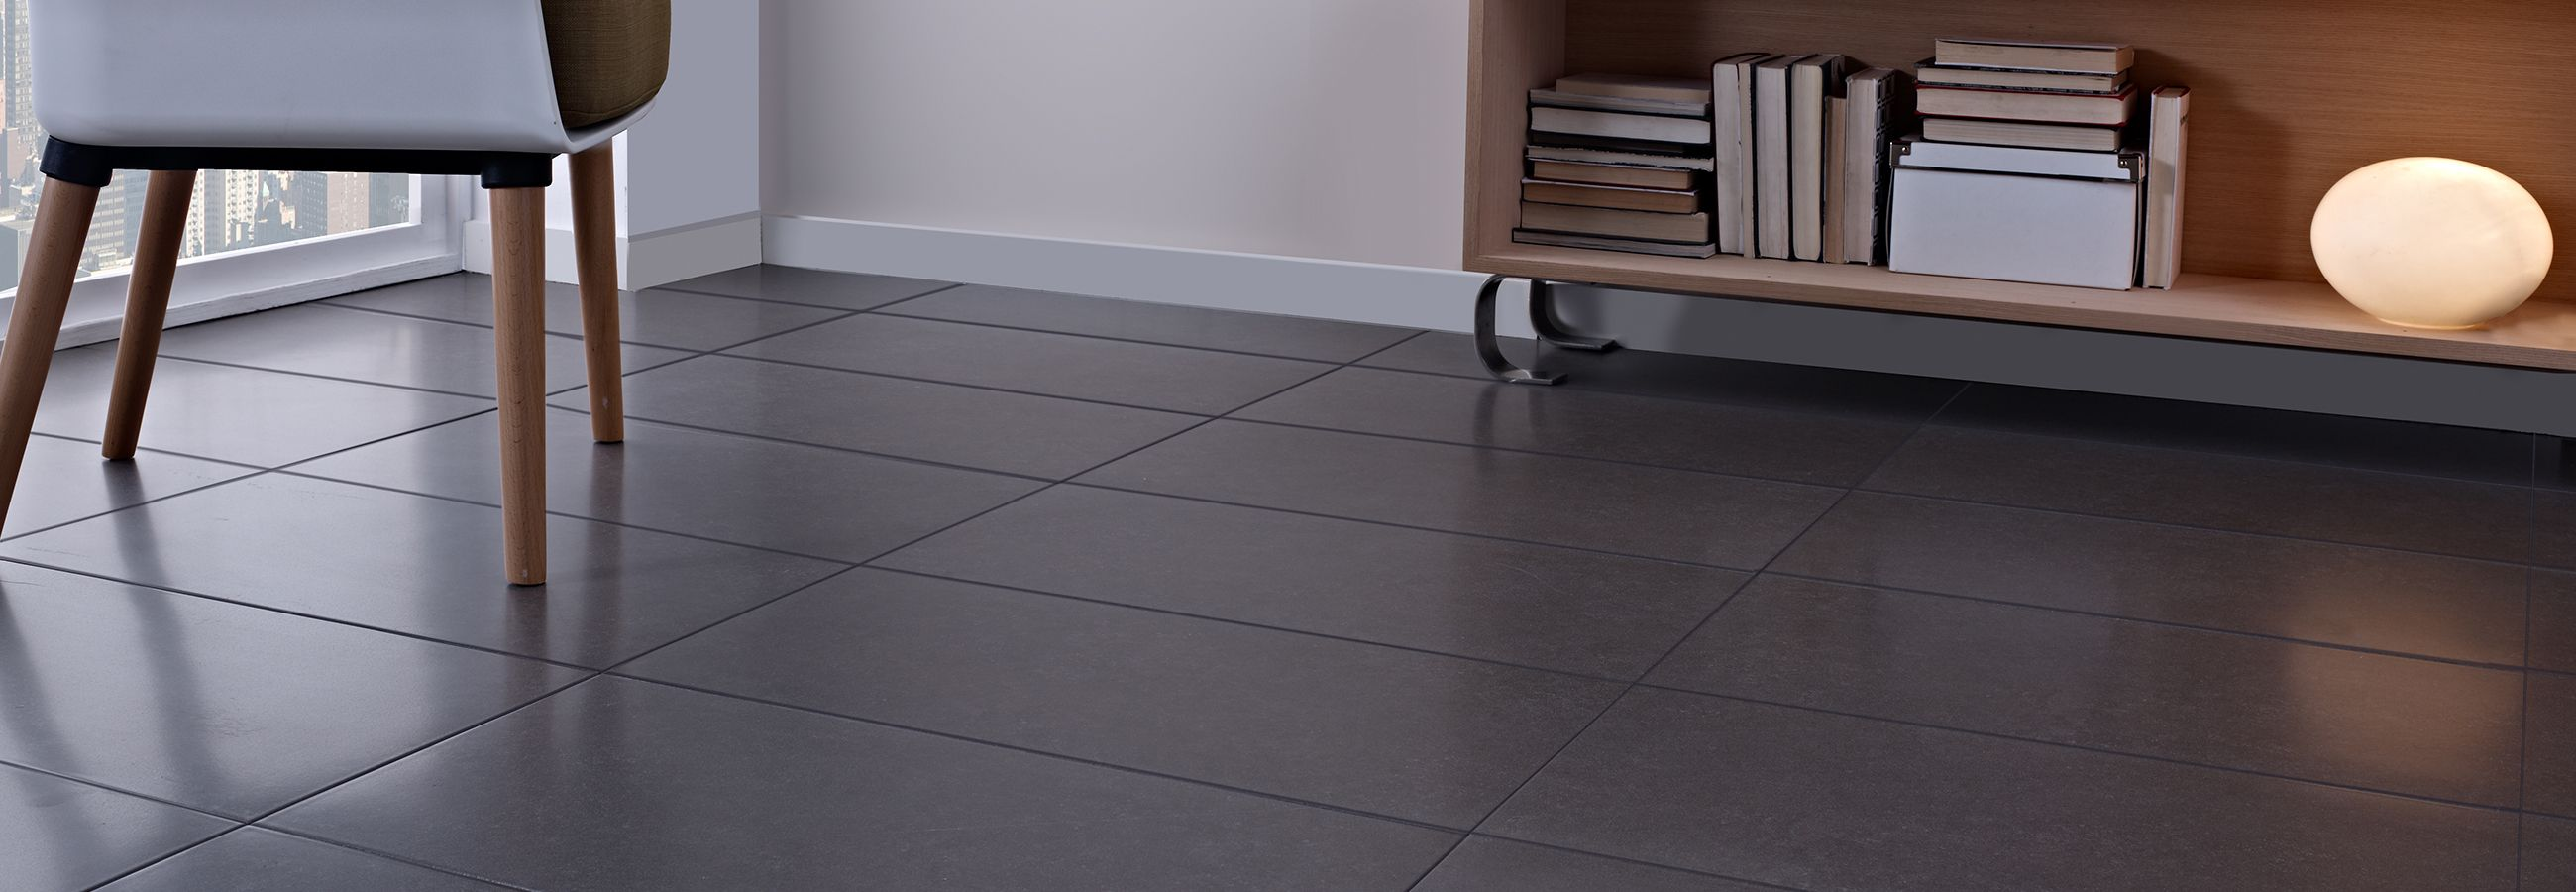 Ceramic tile sergenians floor coveringssergenians floor coverings dailygadgetfo Images